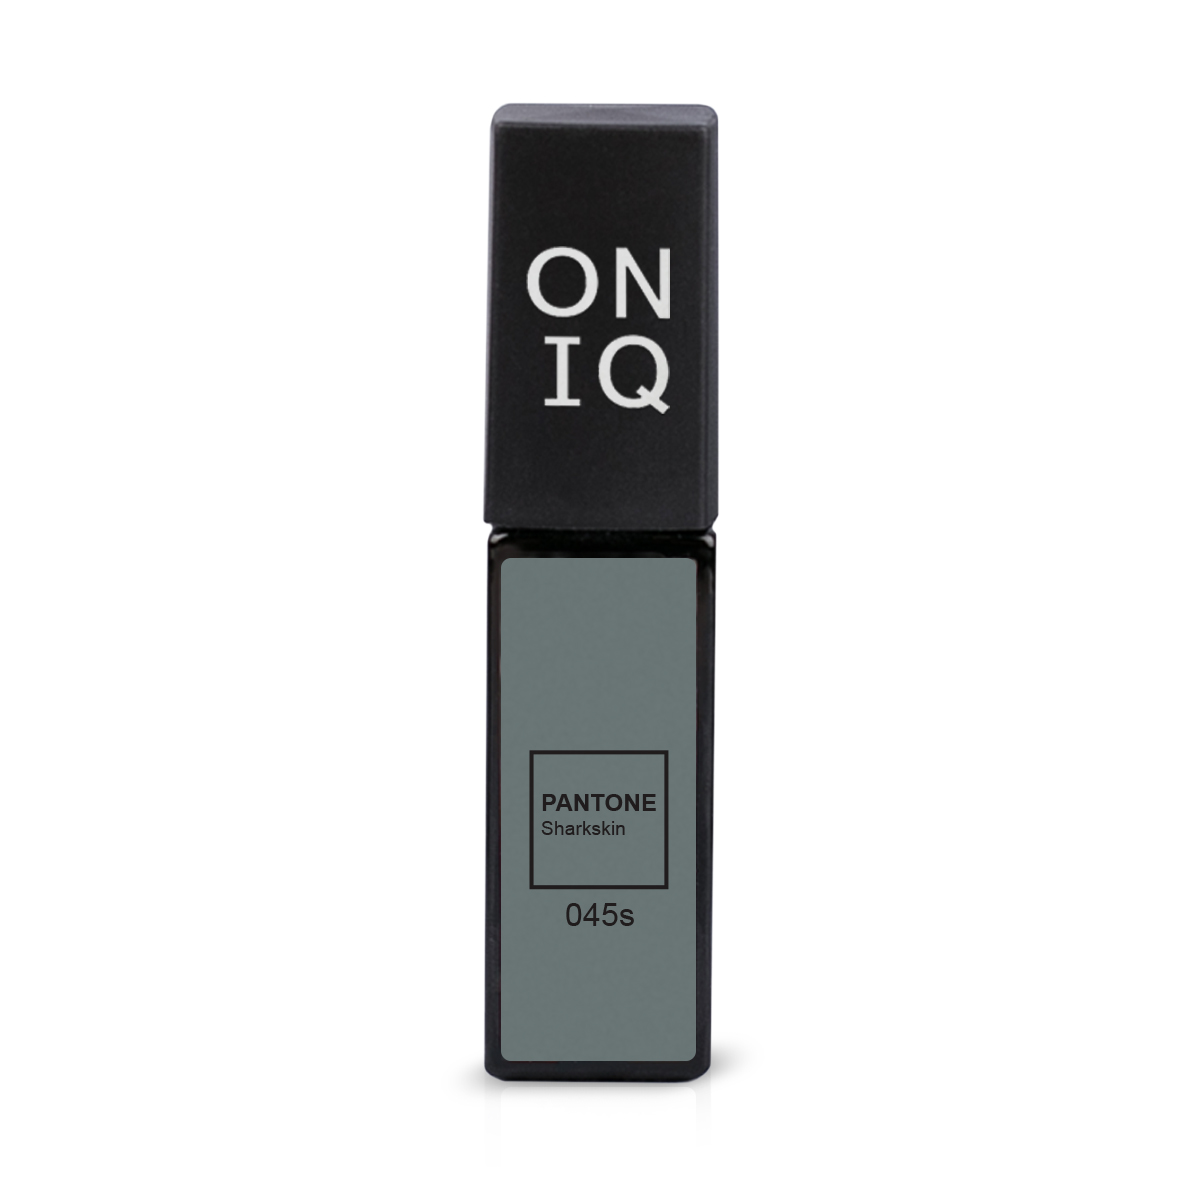 ONIQ Гель-лак для покрытия ногтей, Pantone: Sharkskin, 6 мл